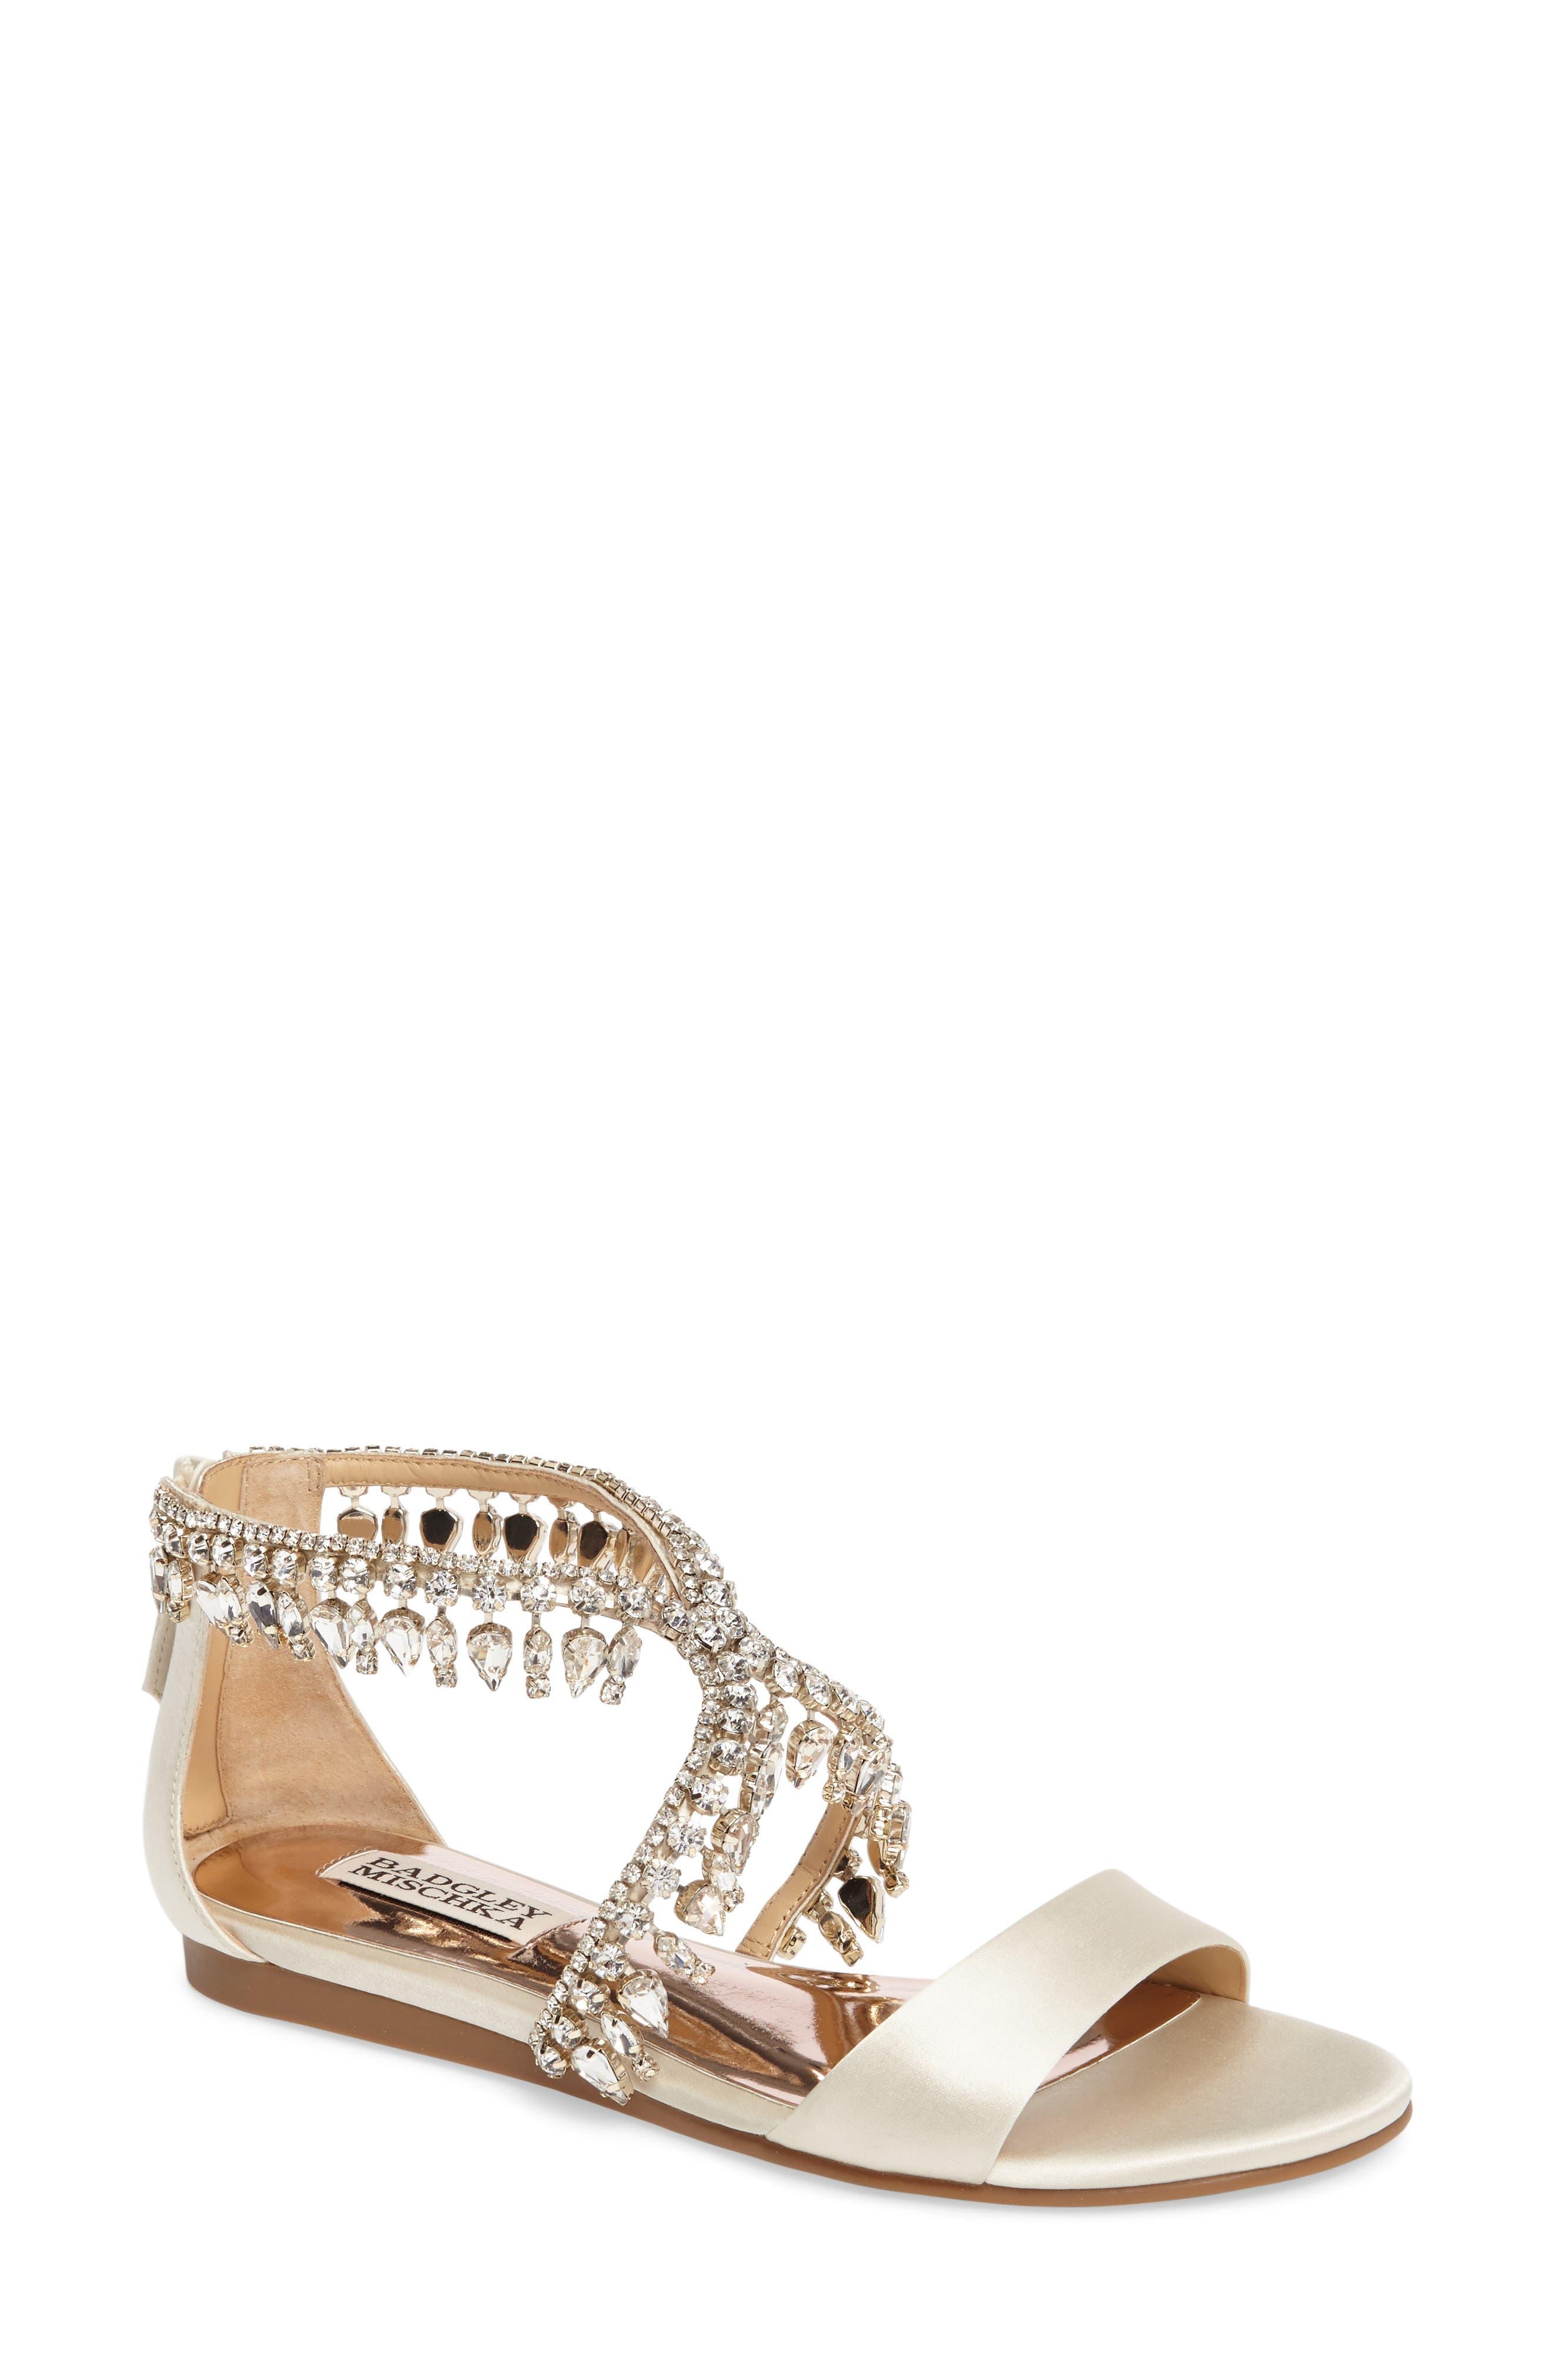 Alternate Image 1 Selected - Badgley Mischka Tristen Crystal Sandal (Women)